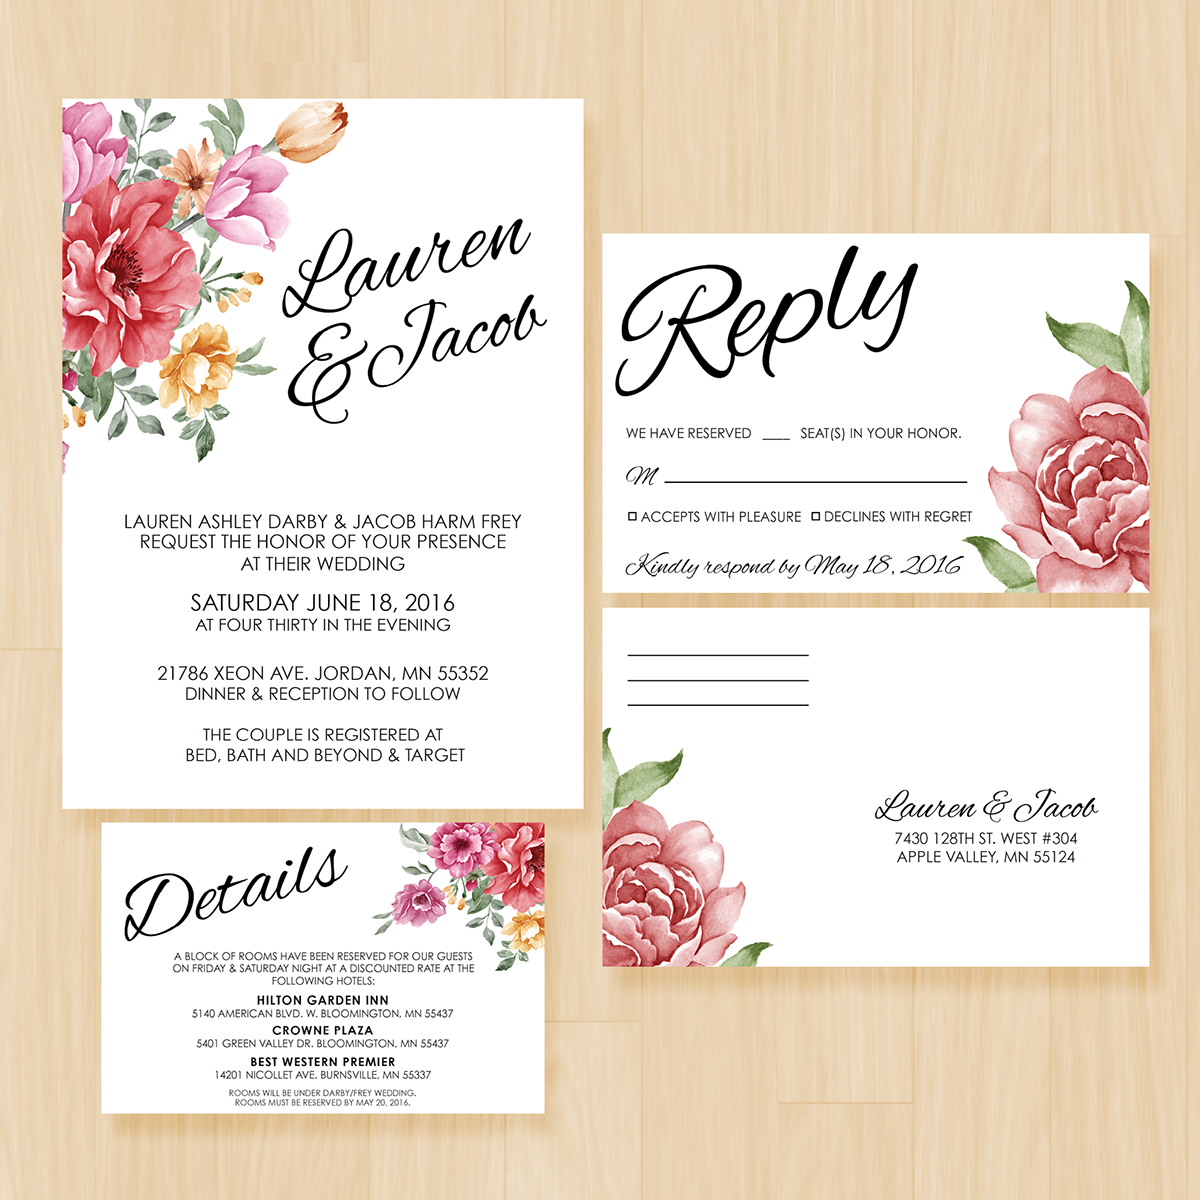 Lauren jacobs wedding invitation suite on behance thank you kristyandbryce Images